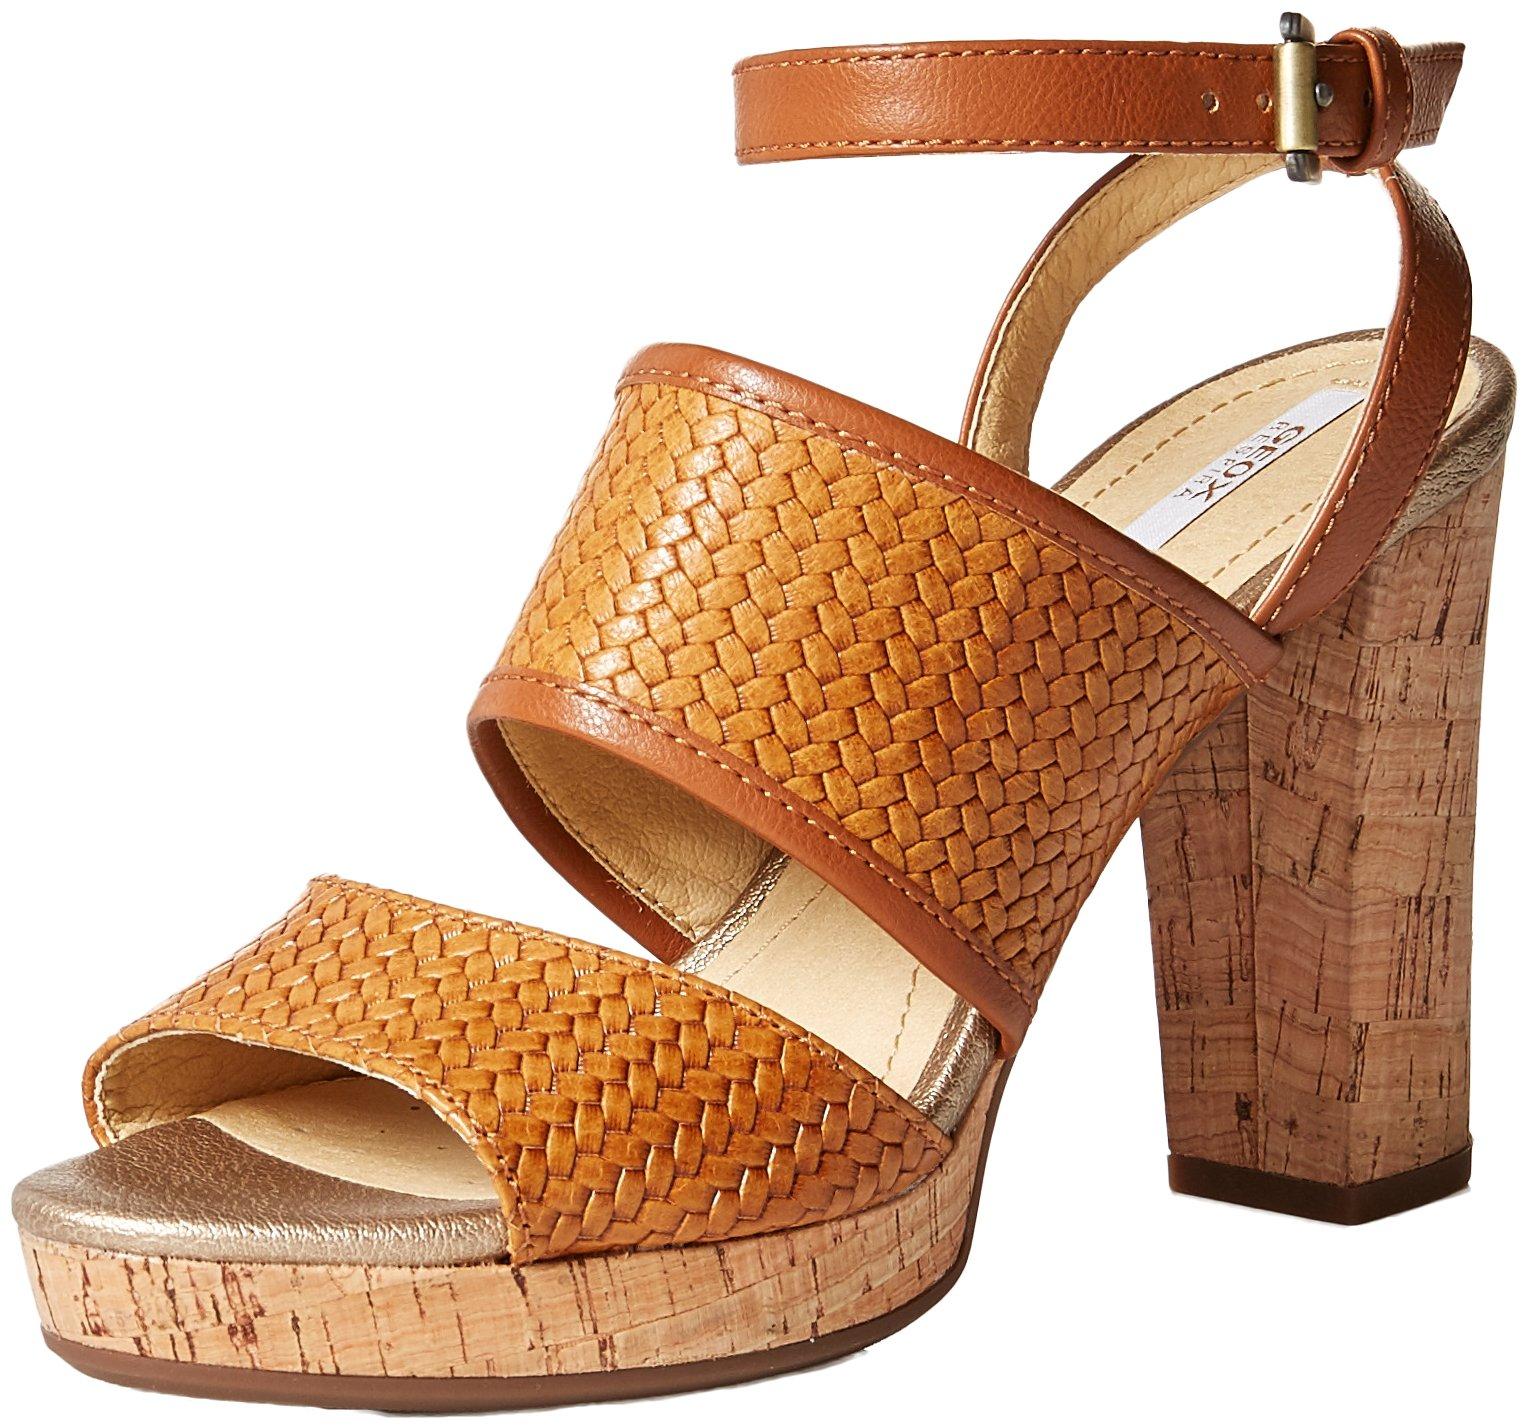 Geox Women's Mauvelle 6 Heeled Sandal, Caramel, 36 M EU (6 US)